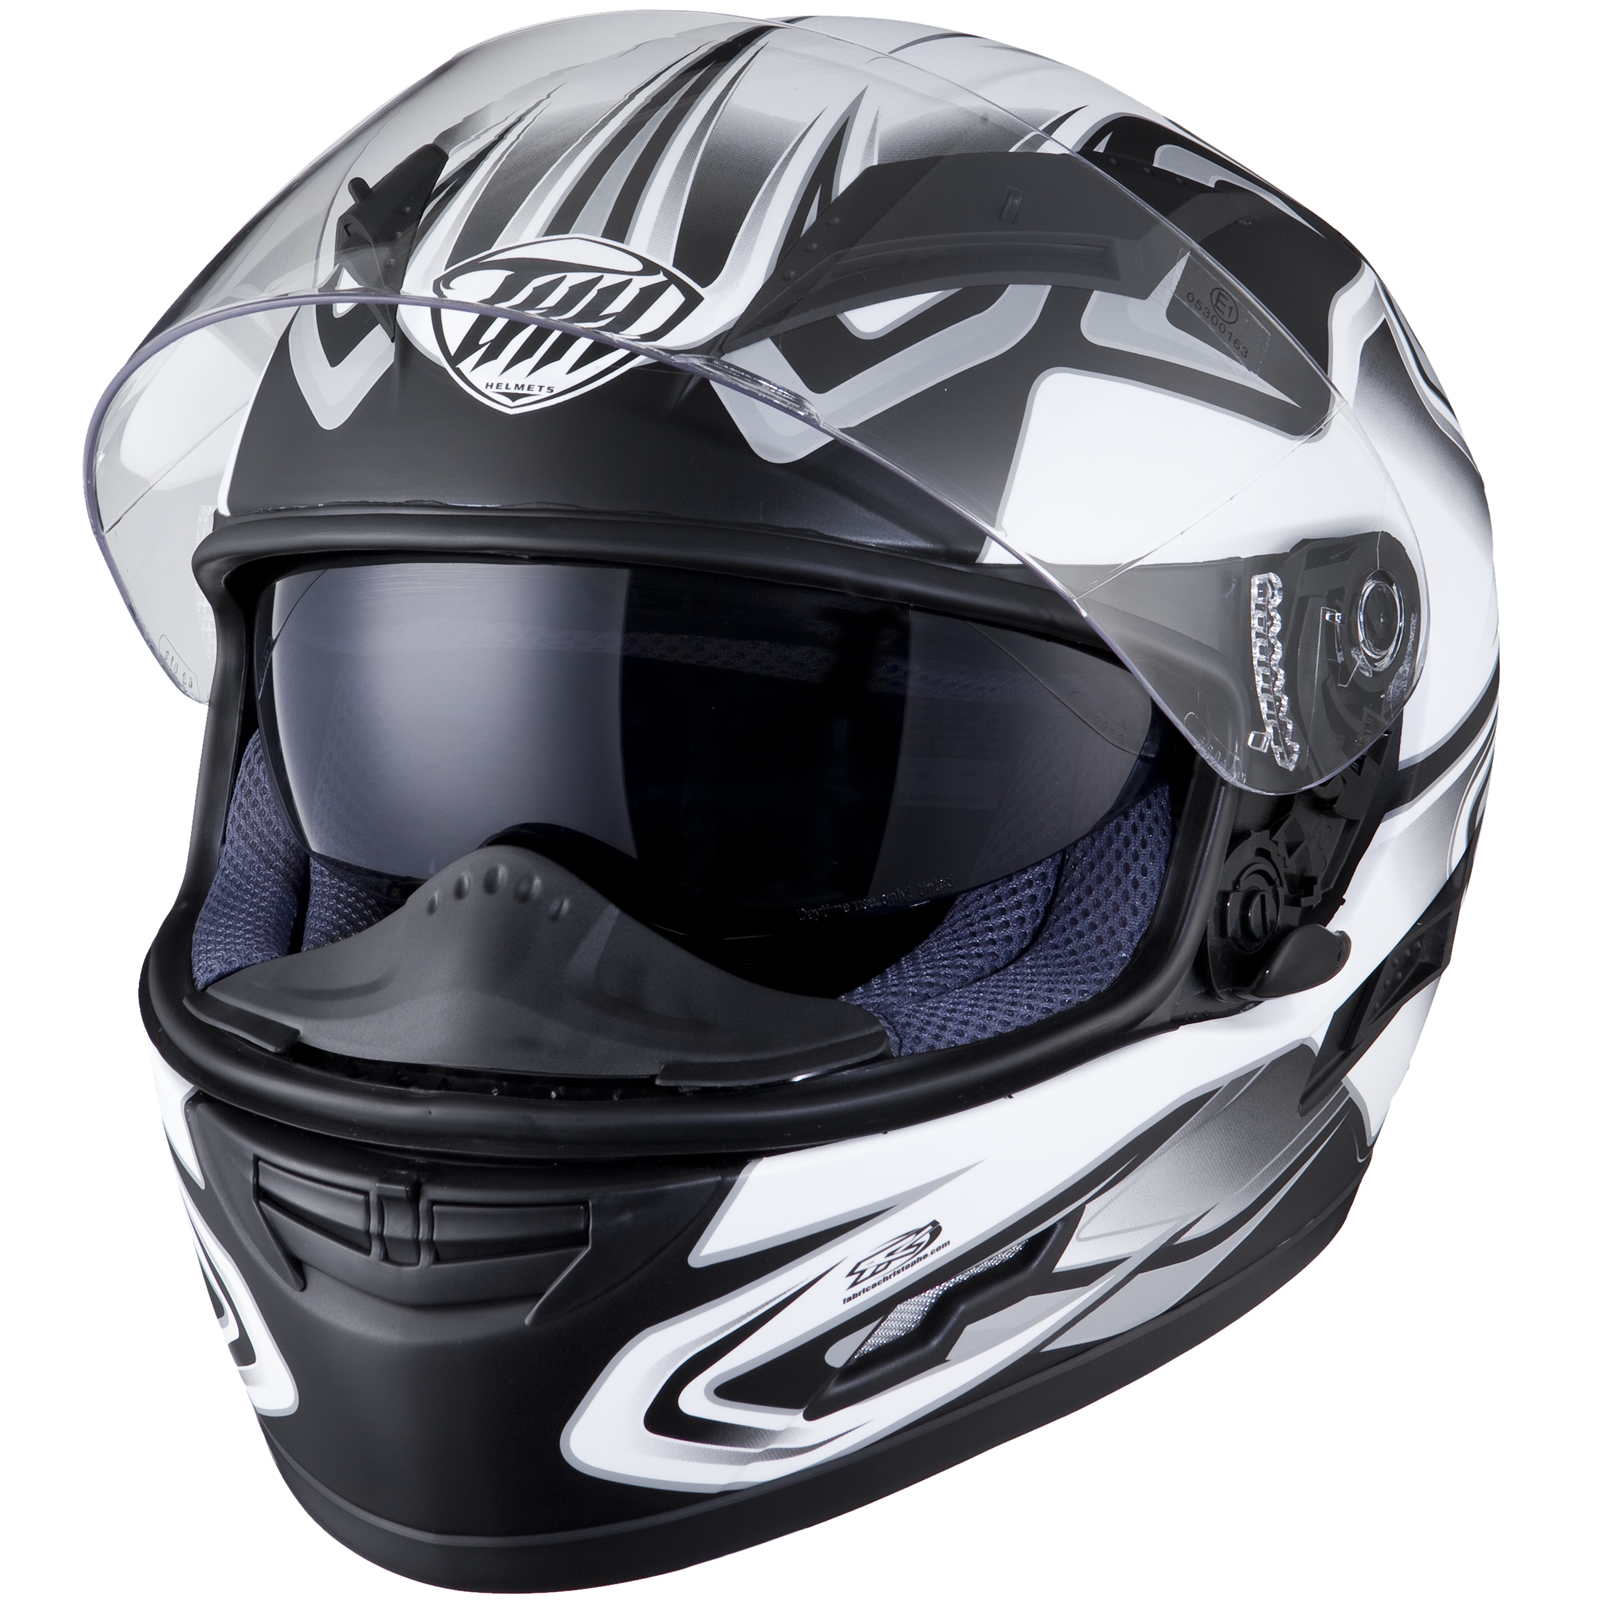 52294c0b THH TS-80 #4 Black Grey Motorcycle Helmet Full Face Internal Drop ...